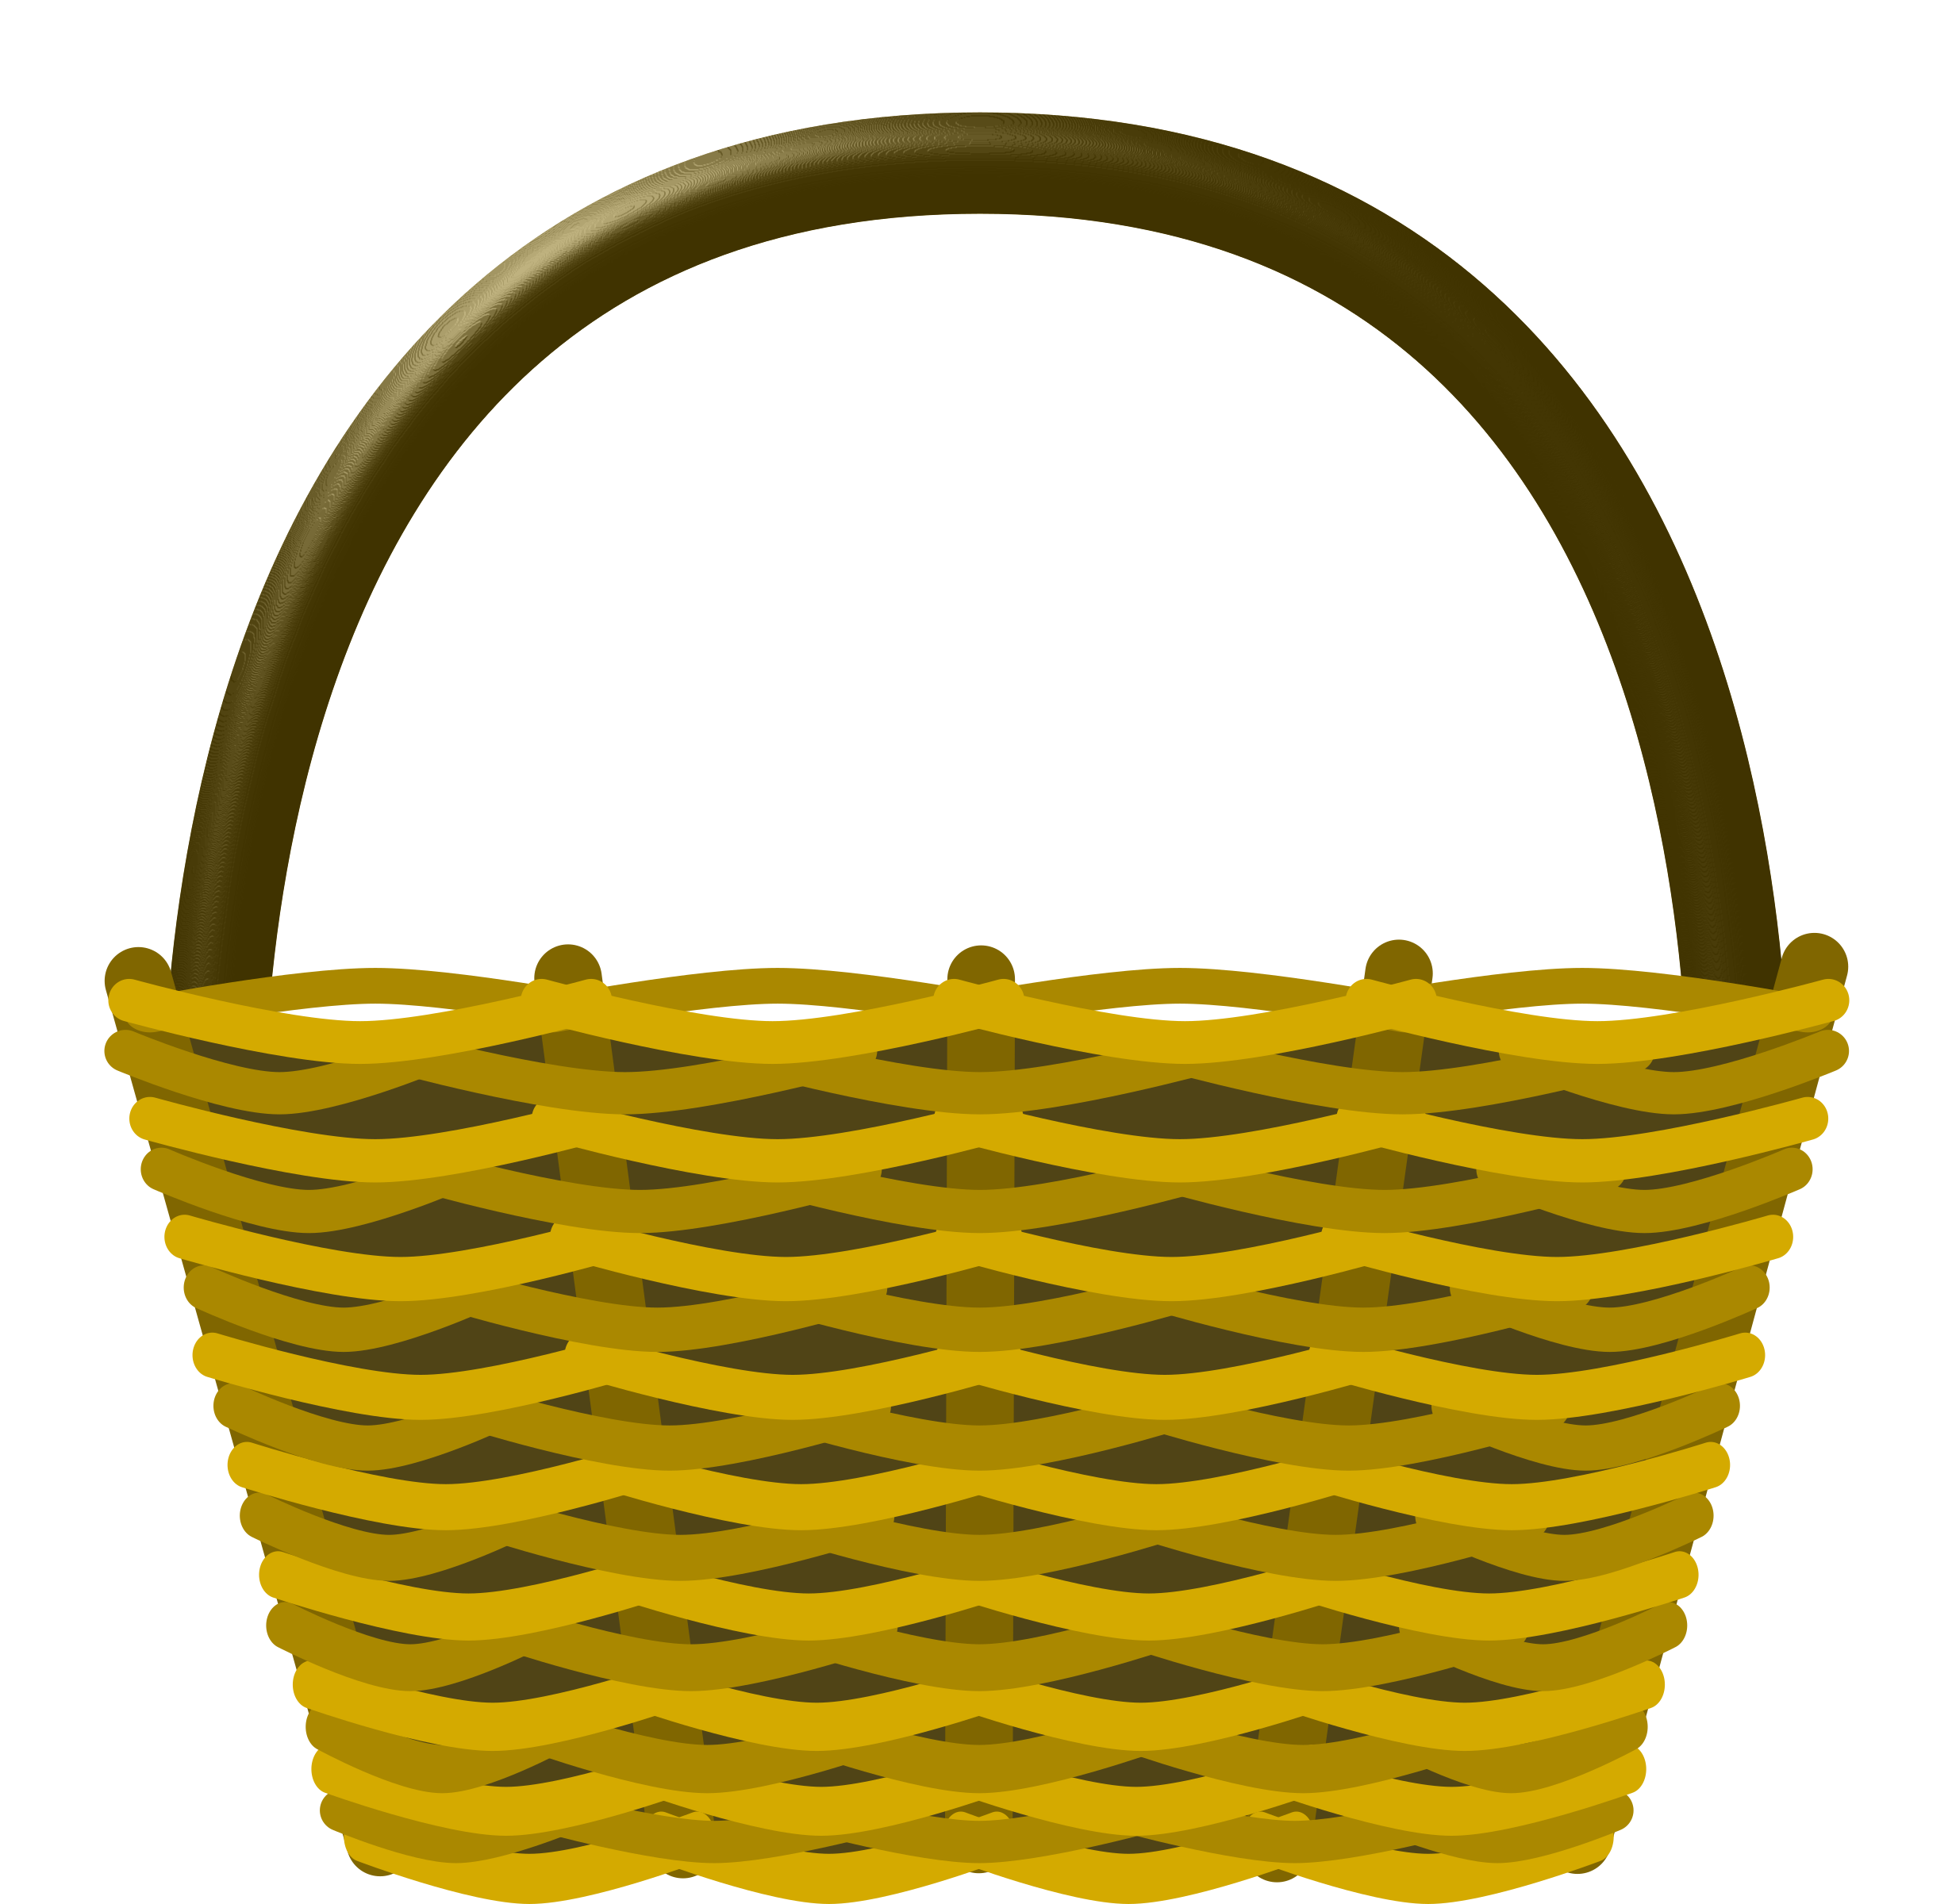 Basket clipart tumundografico 2